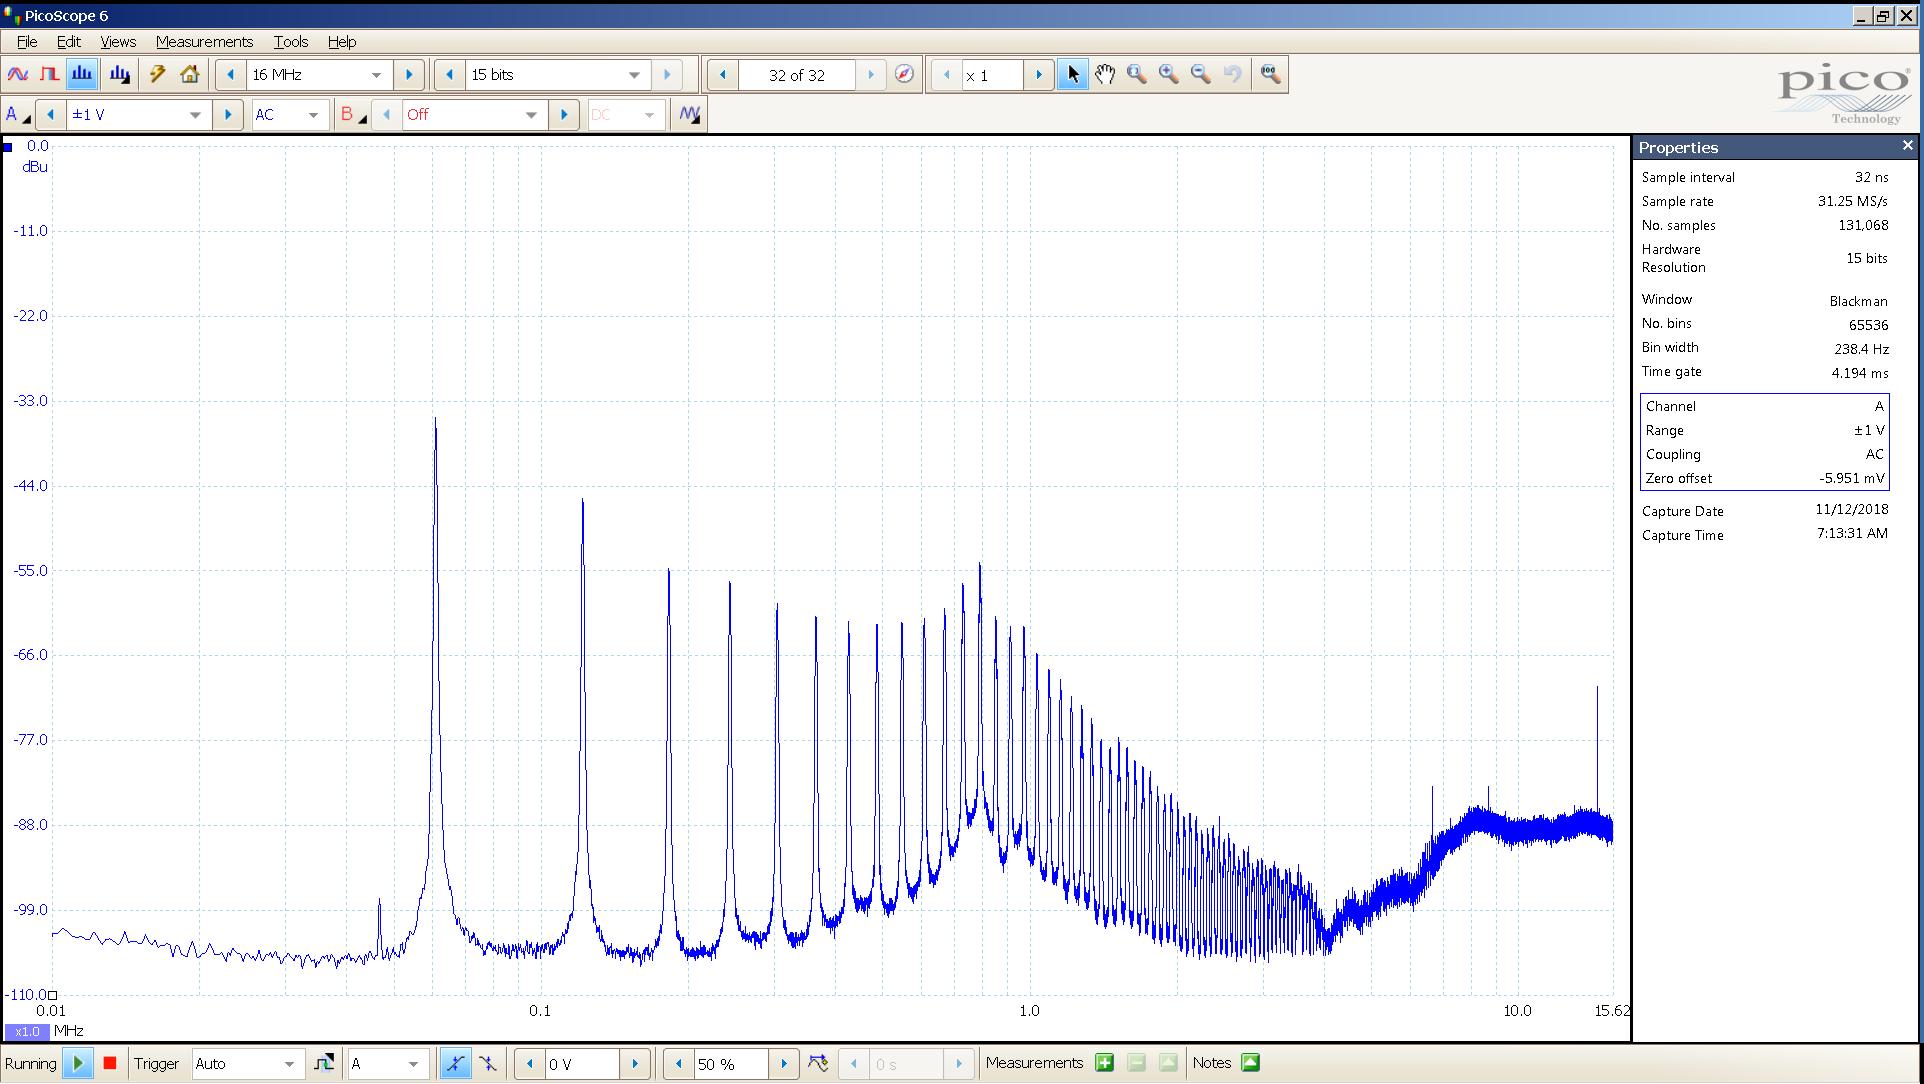 20181112-48 36V 56R residual noise 200mV FFT 10KHz - 15MHz - SMPS.png